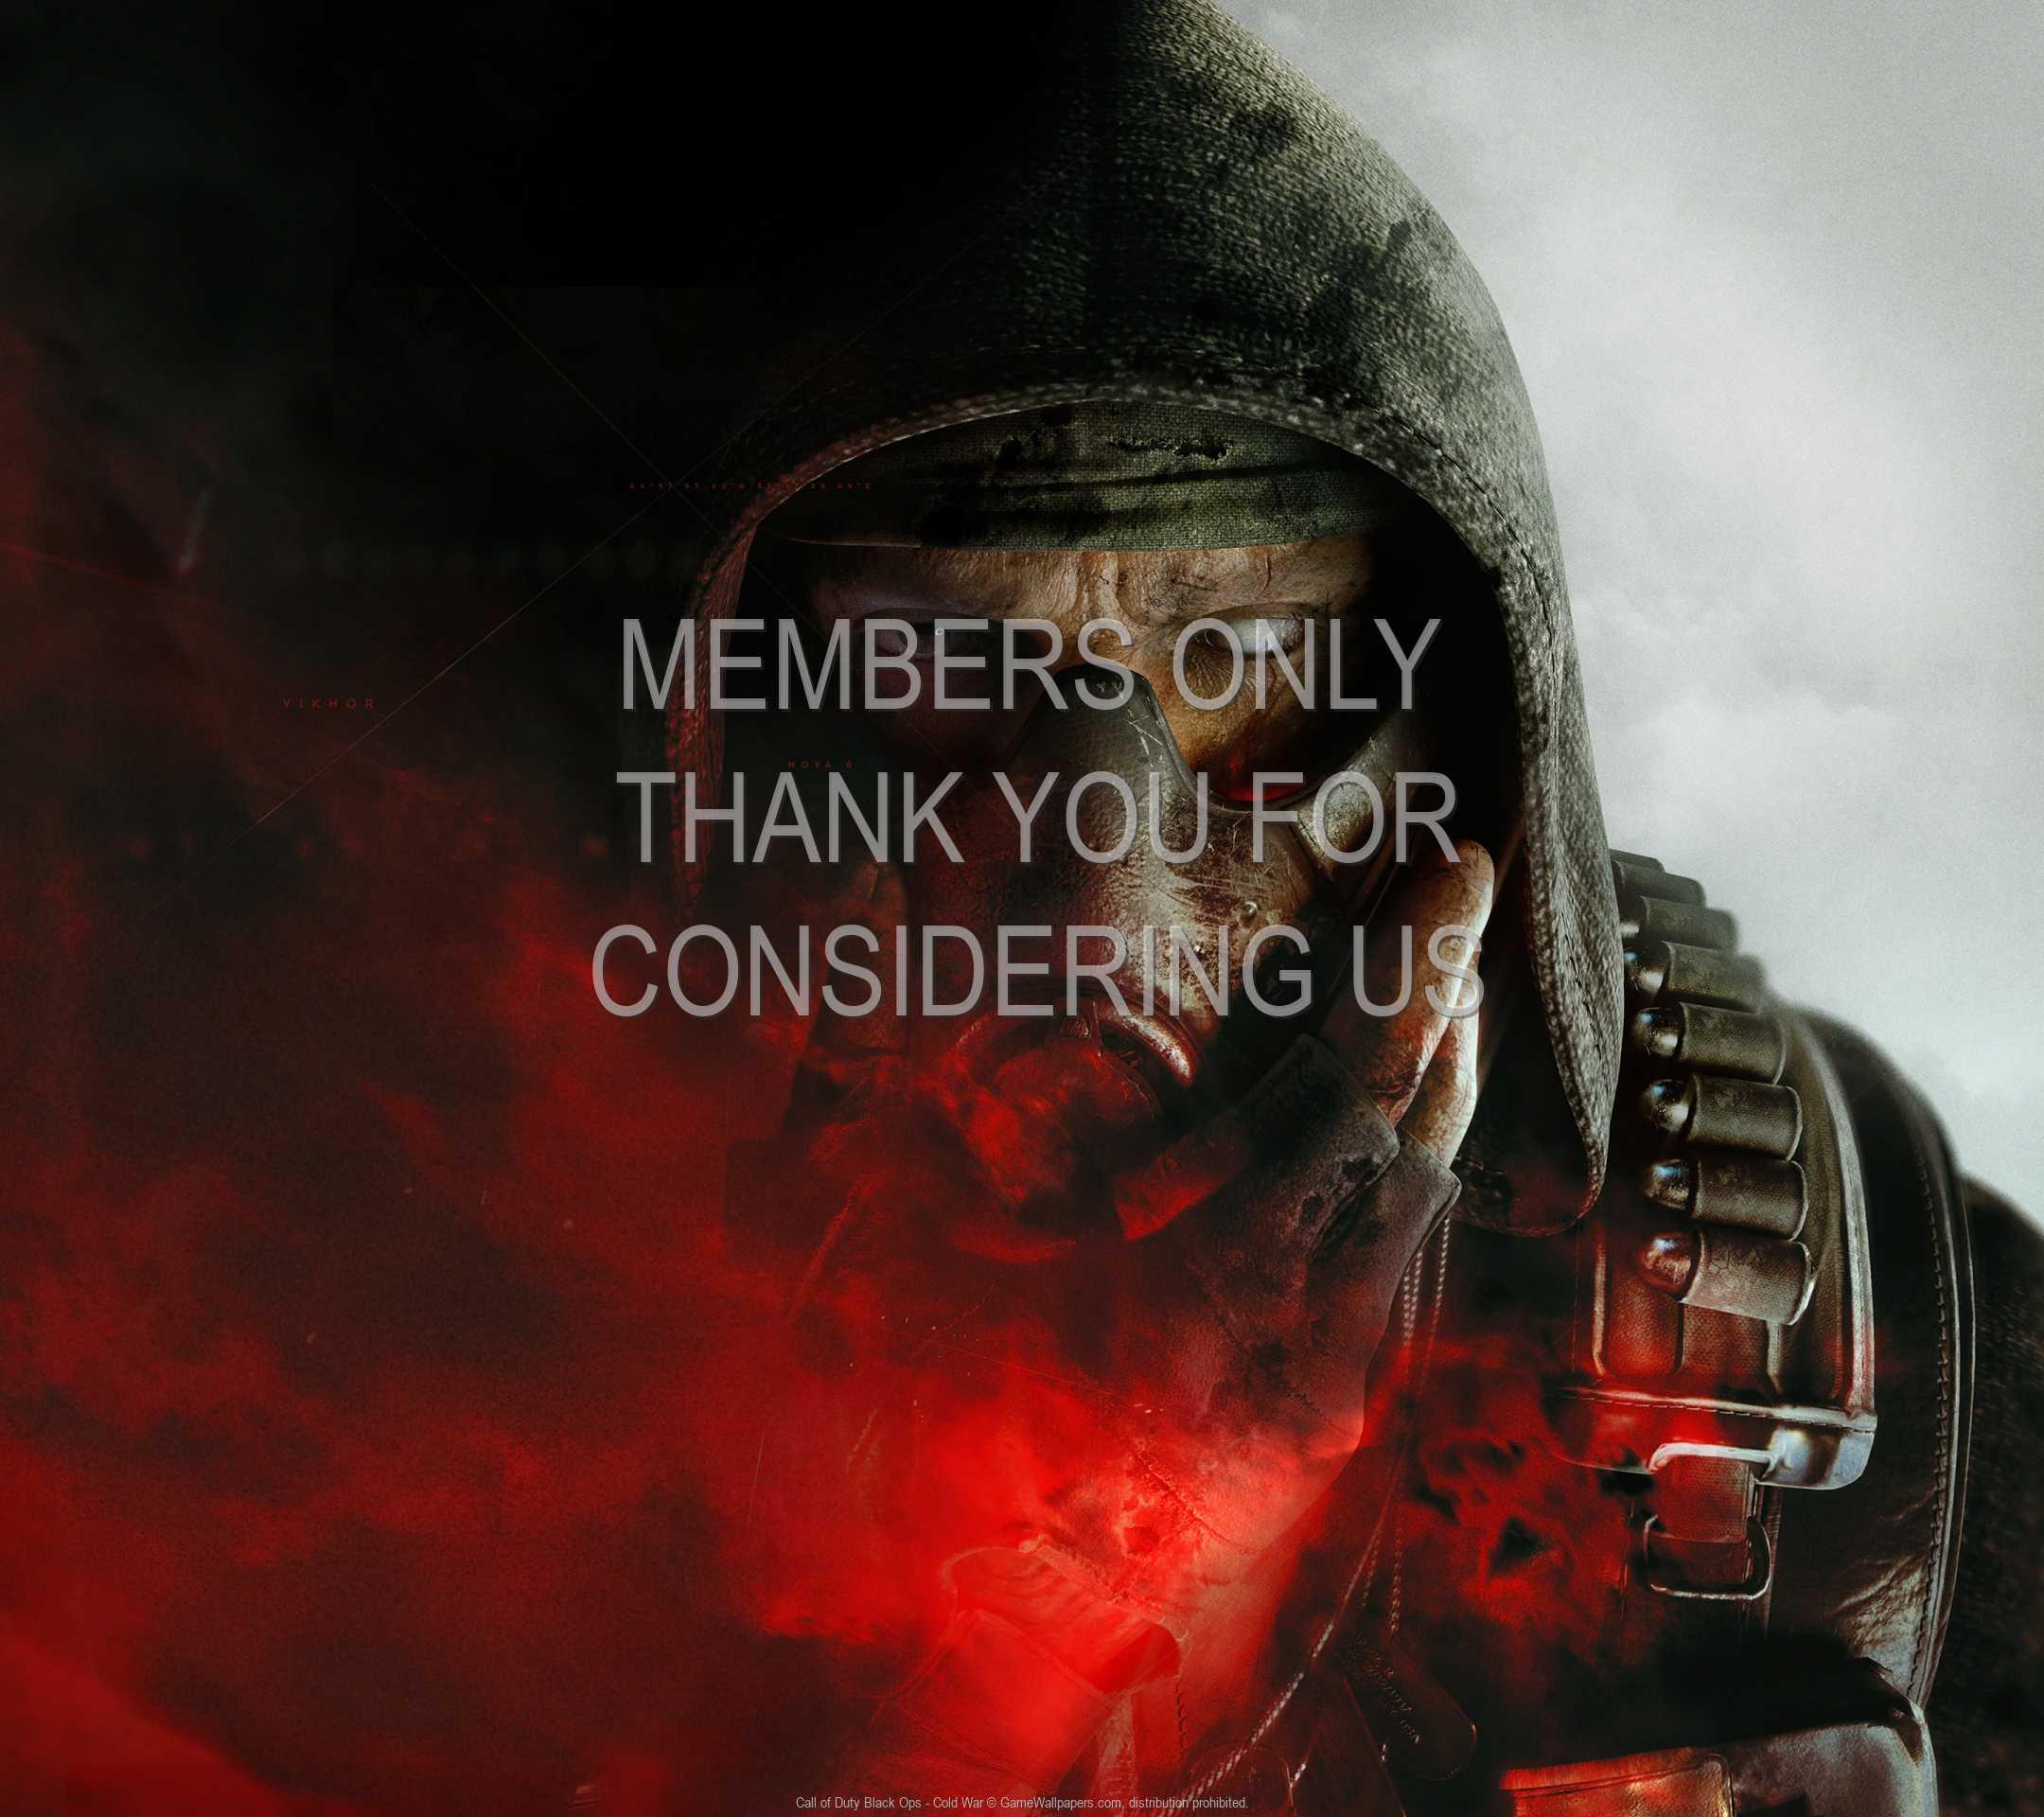 Call of Duty: Black Ops - Cold War 1080p Horizontal Handy Hintergrundbild 02